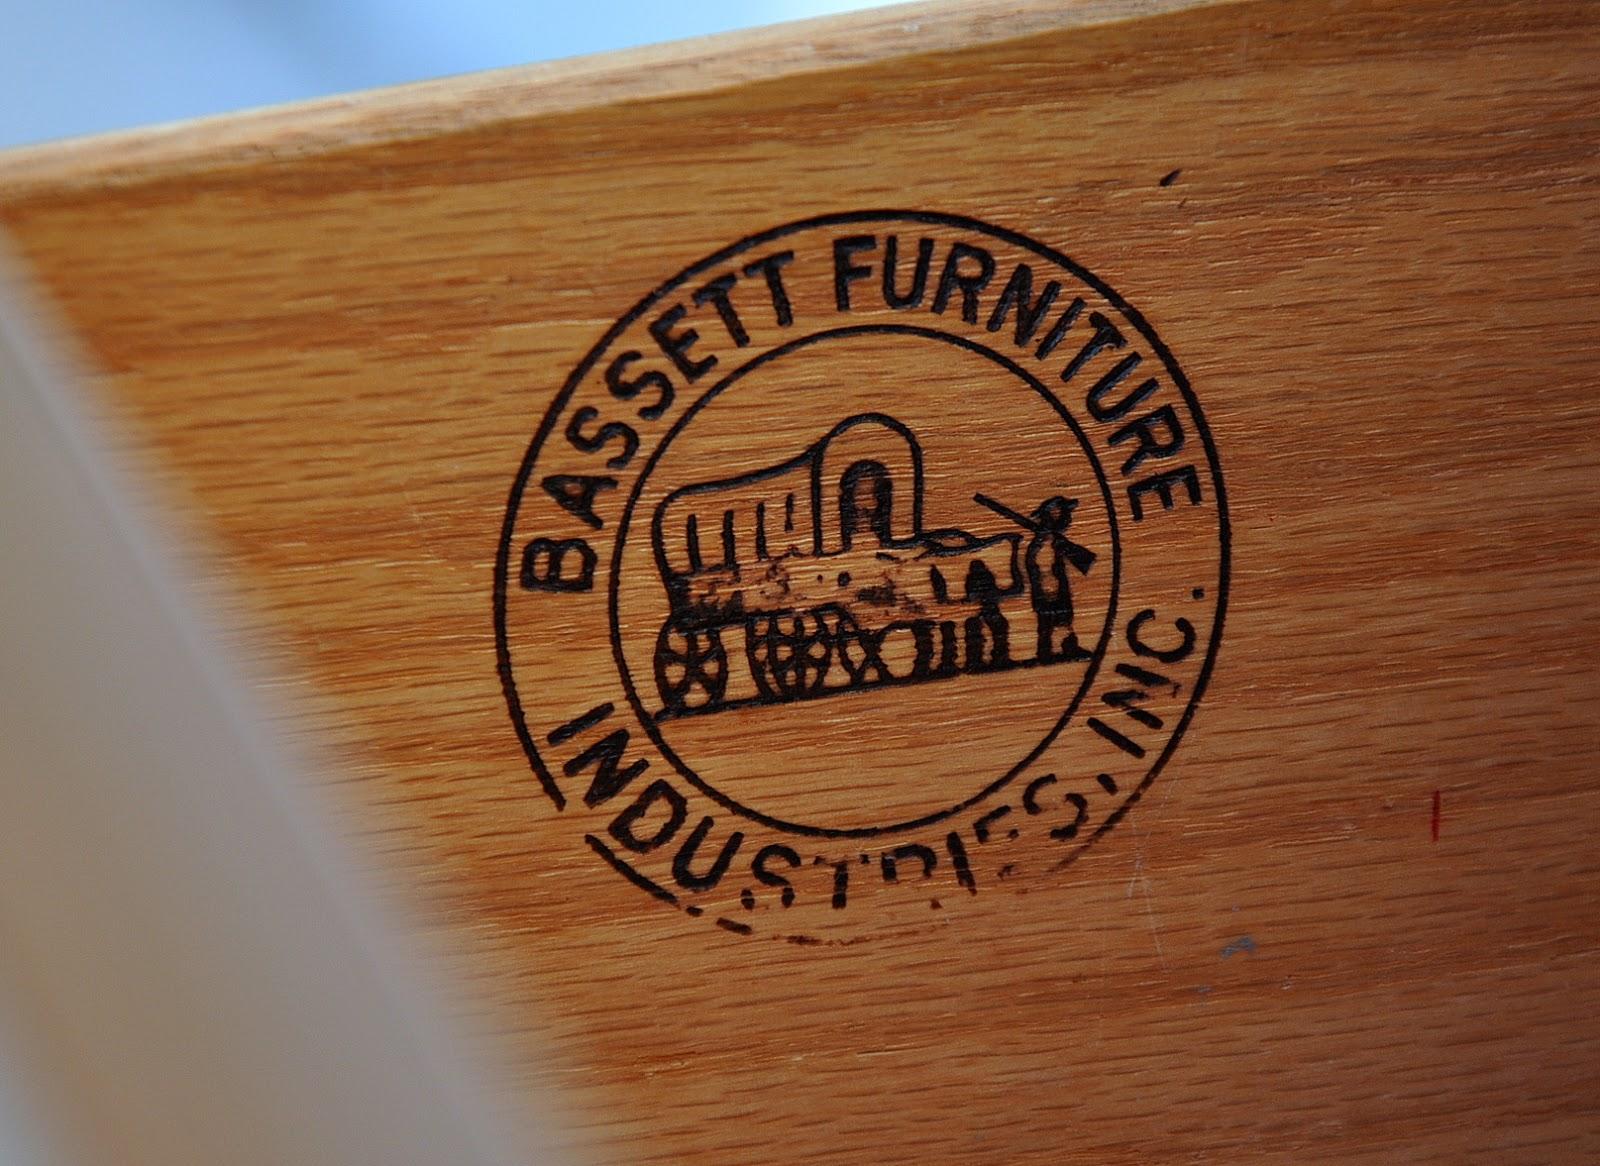 bassett furniture logo. Bassett Furniture Logo